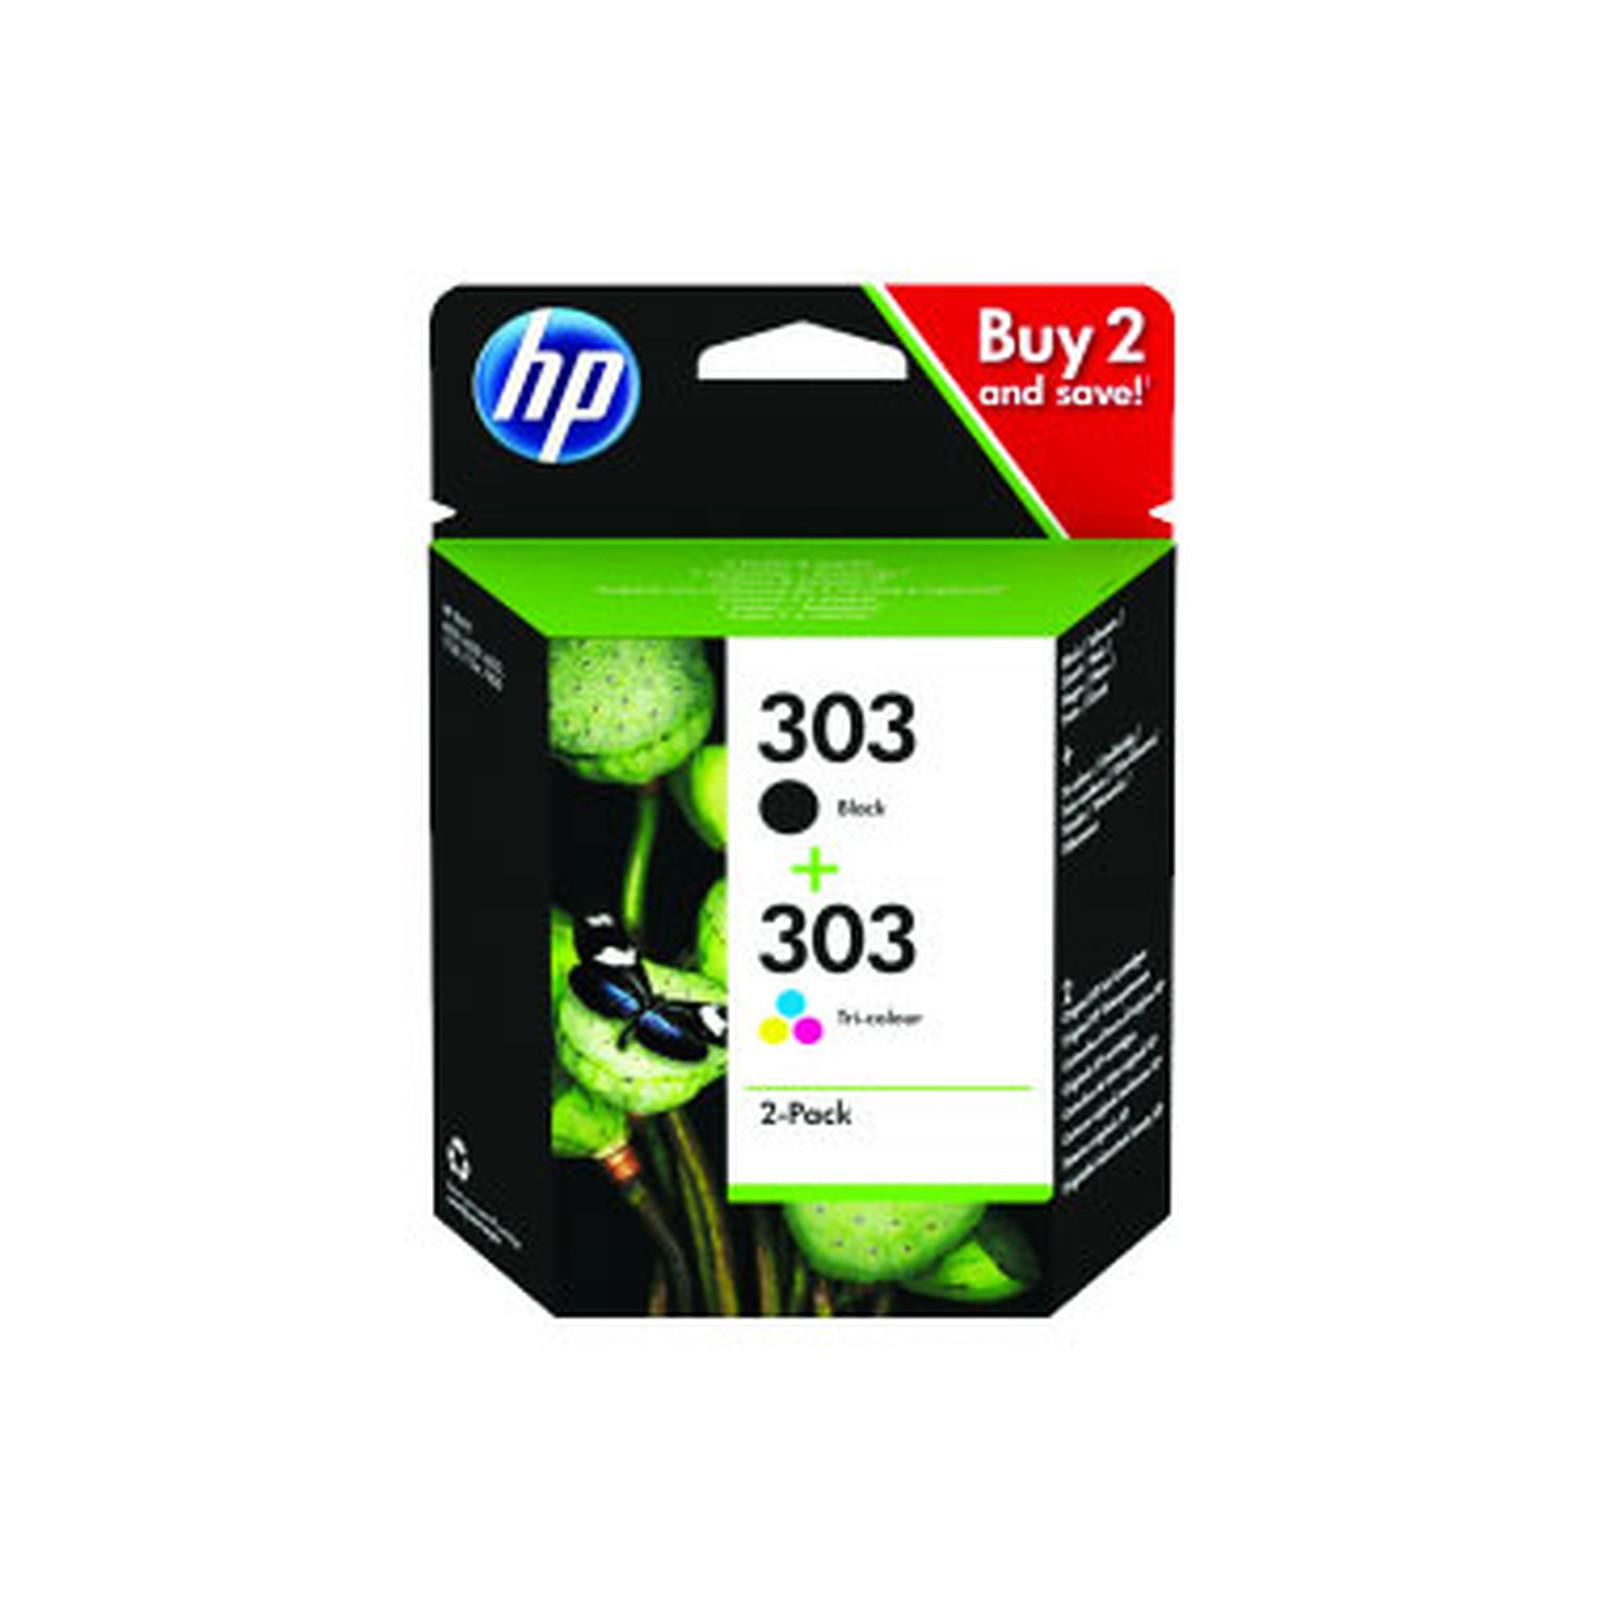 HP 303 Pack - 3YM92AE